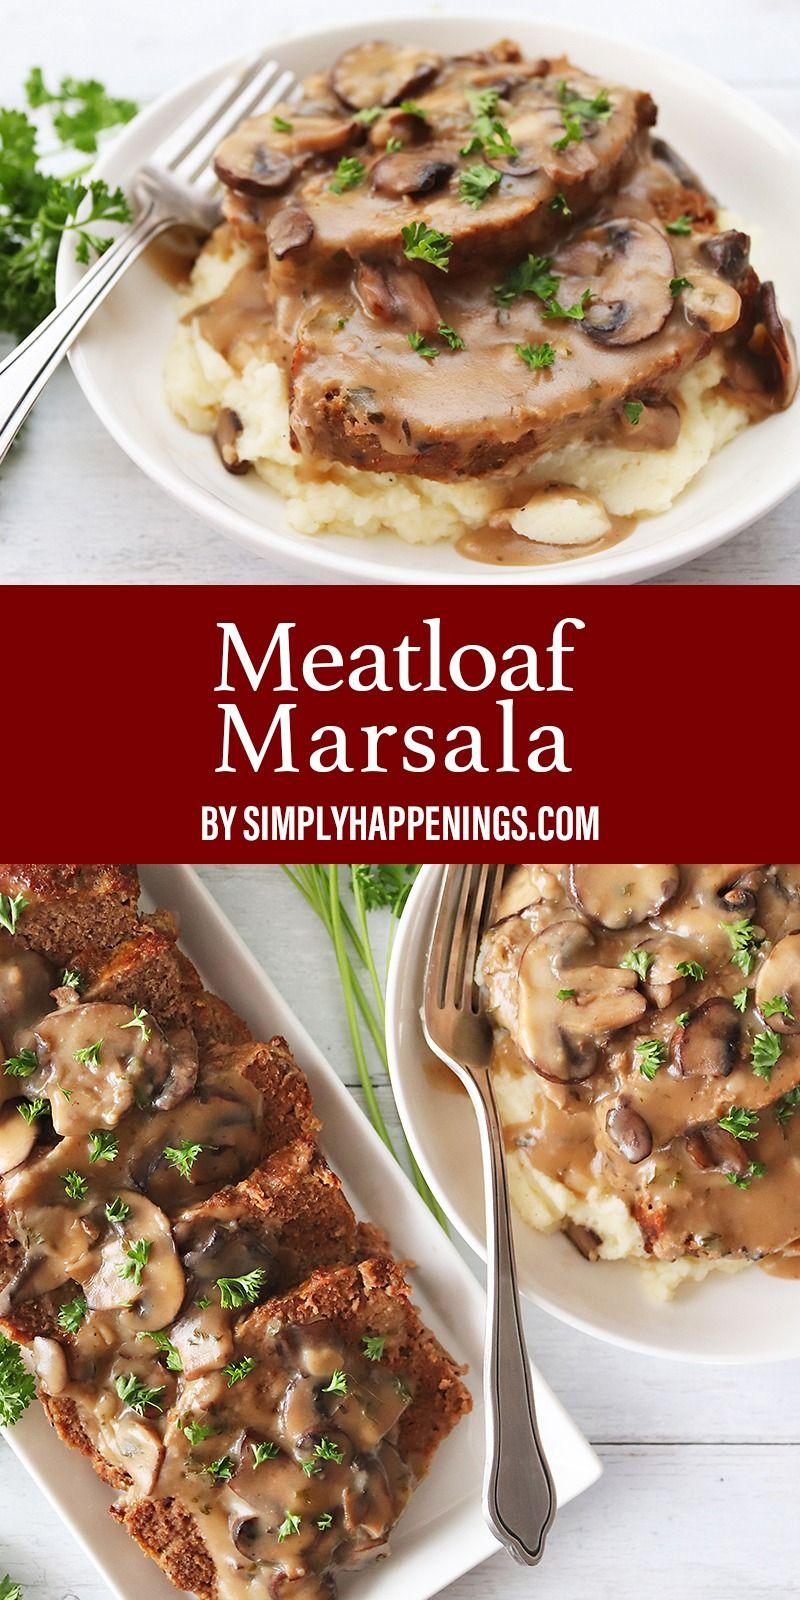 Meatloaf Marsala Simply Happenings Recipe In 2020 Meatloaf Ground Beef Meatloaf Sides